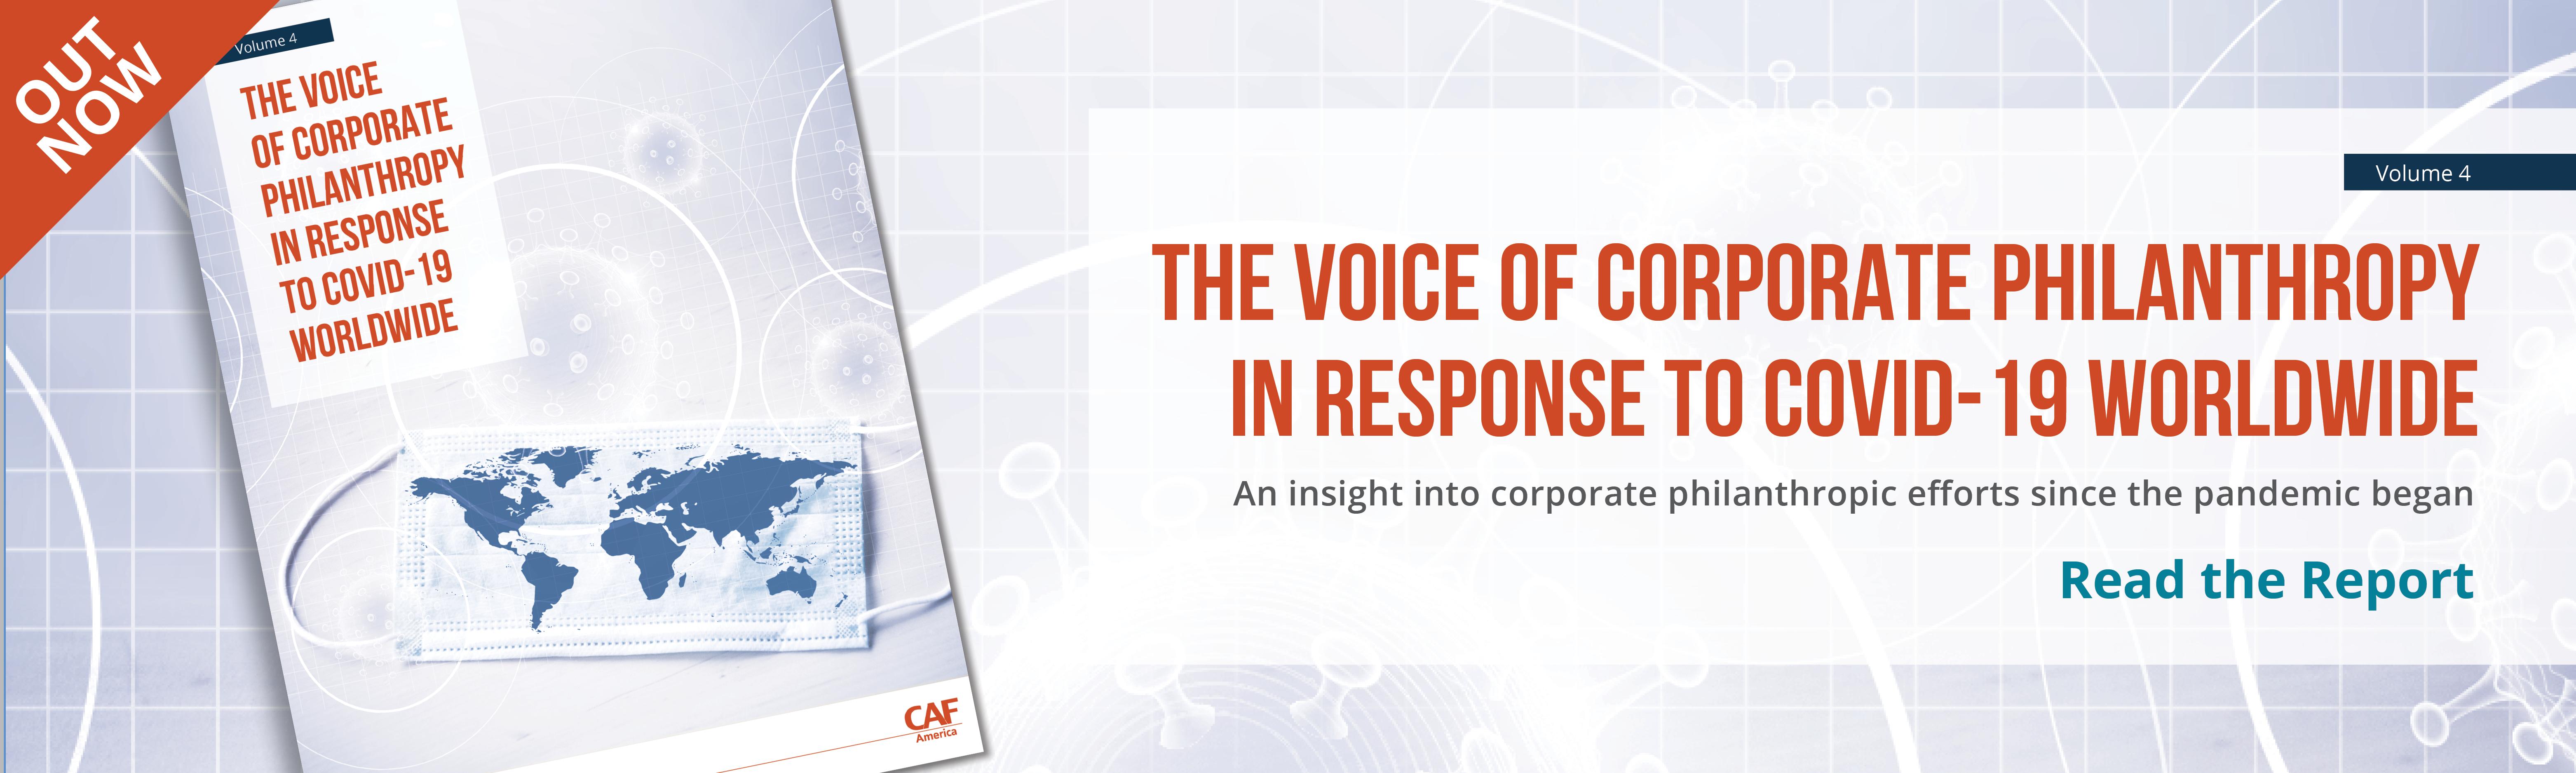 Voice of Corporate Philanthropy volume 4 ad